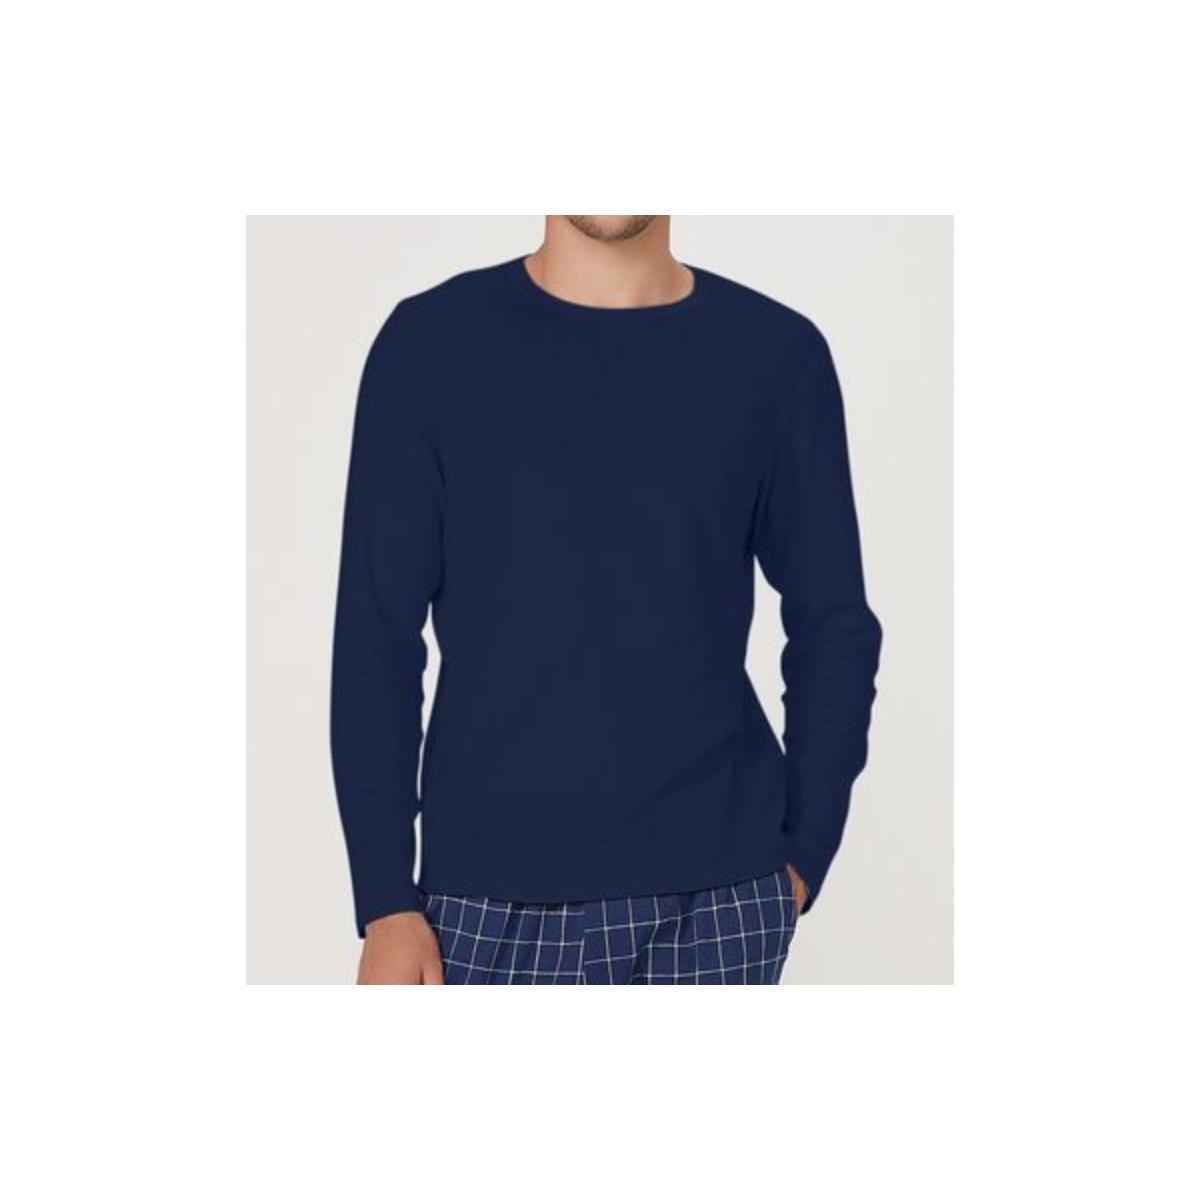 Camiseta Masculina Hering 7cep Axten Marinho